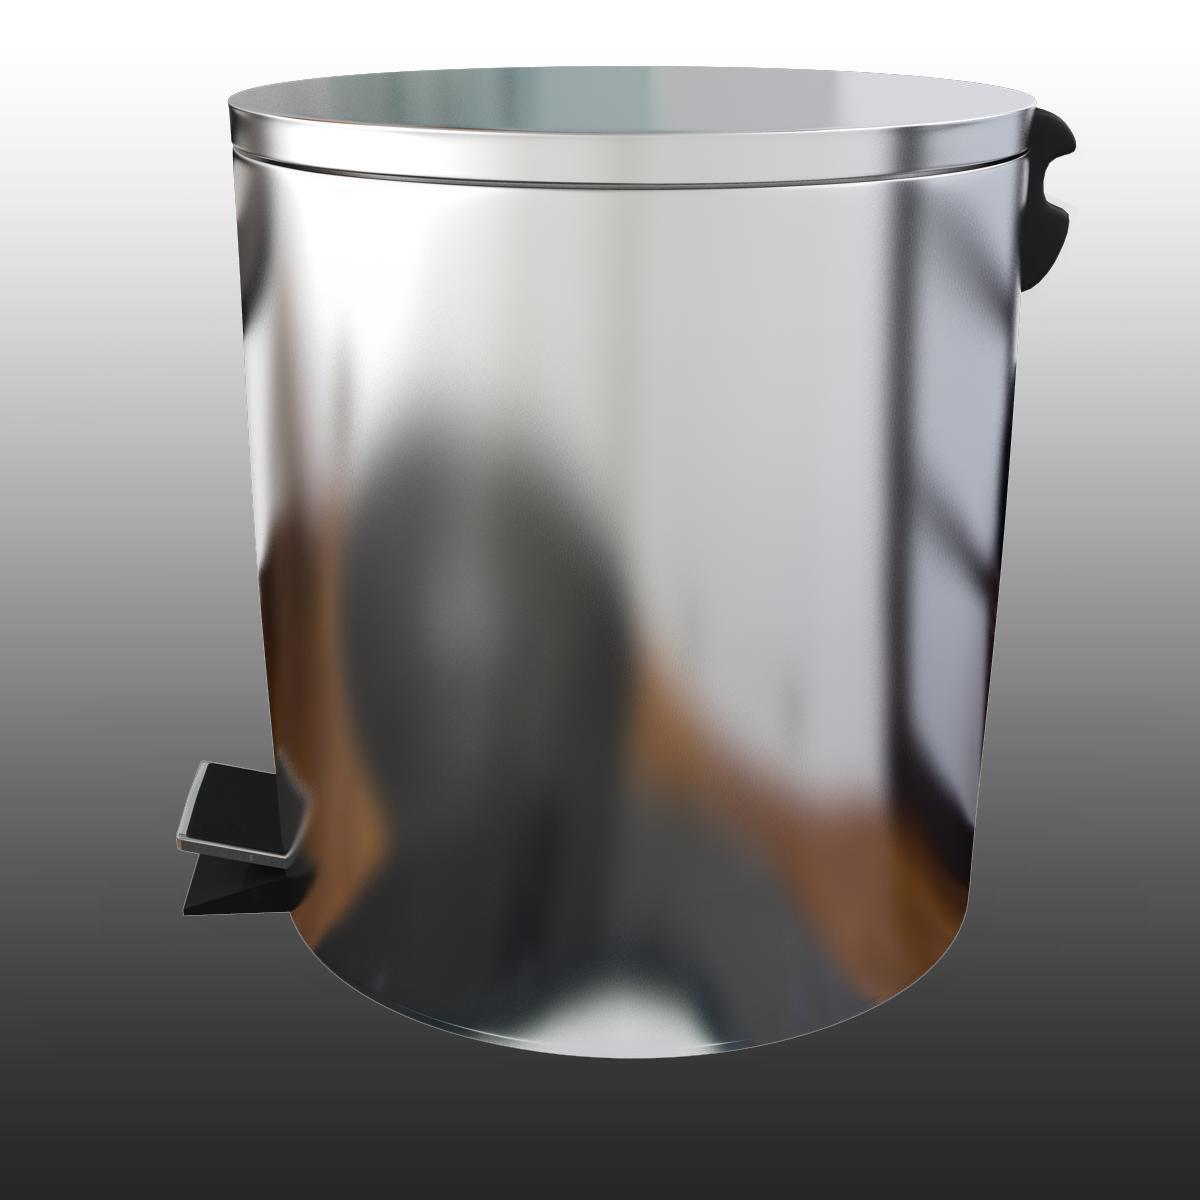 bathroom dumpster 3d model 3ds max fbx ma mb obj 155982